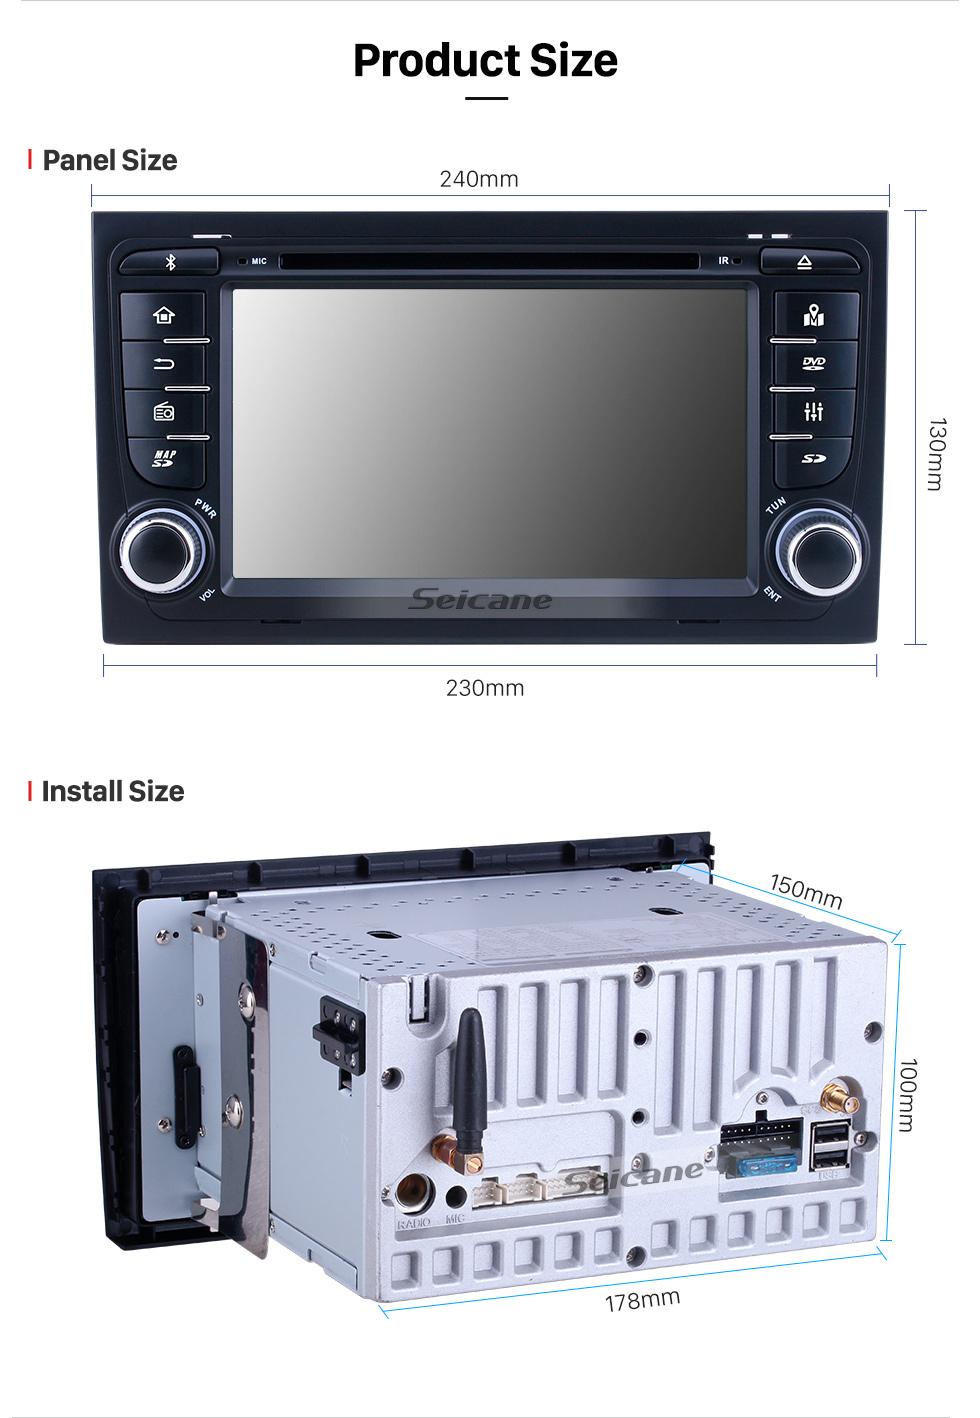 Seicane HD 1024*600 Multitáctil pantalla Android 9.0 DVD Navigation Jefe Unidad para 2003-2011 Audi A4 S4 RS4 with Radio Tuner 4G WiFi Bluetooth Música Espejo Enlace OBD2 AUX DVR